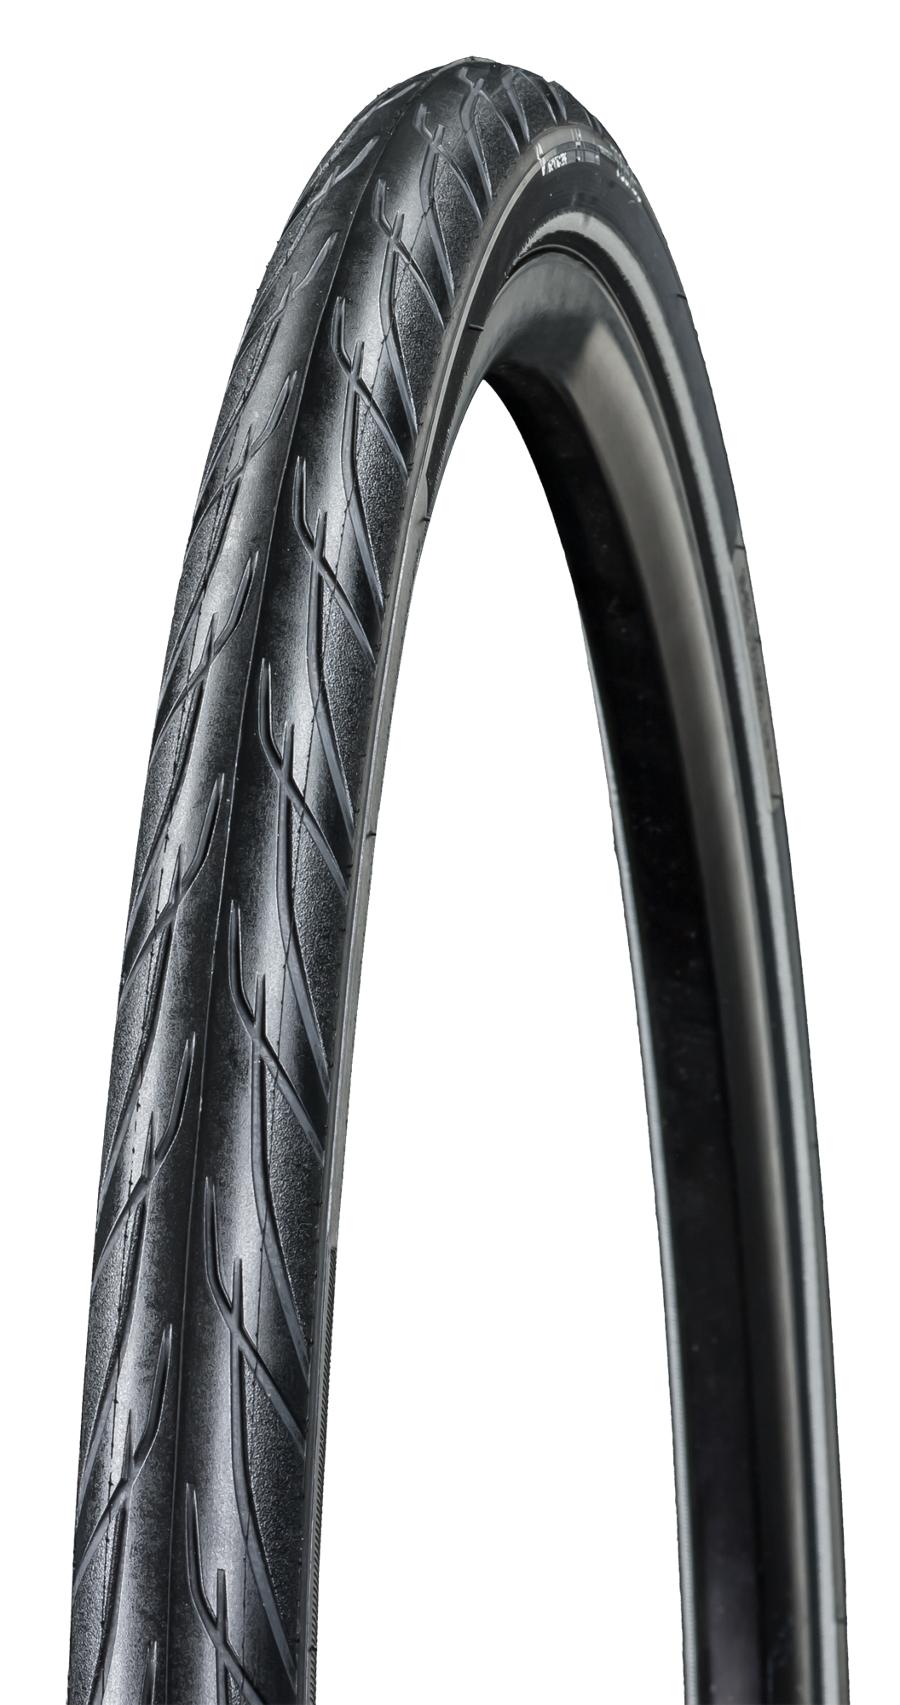 Bontrager Reifen H1 Hard-Case Ultimate 700x35C Reflective - Bontrager Reifen H1 Hard-Case Ultimate 700x35C Reflective